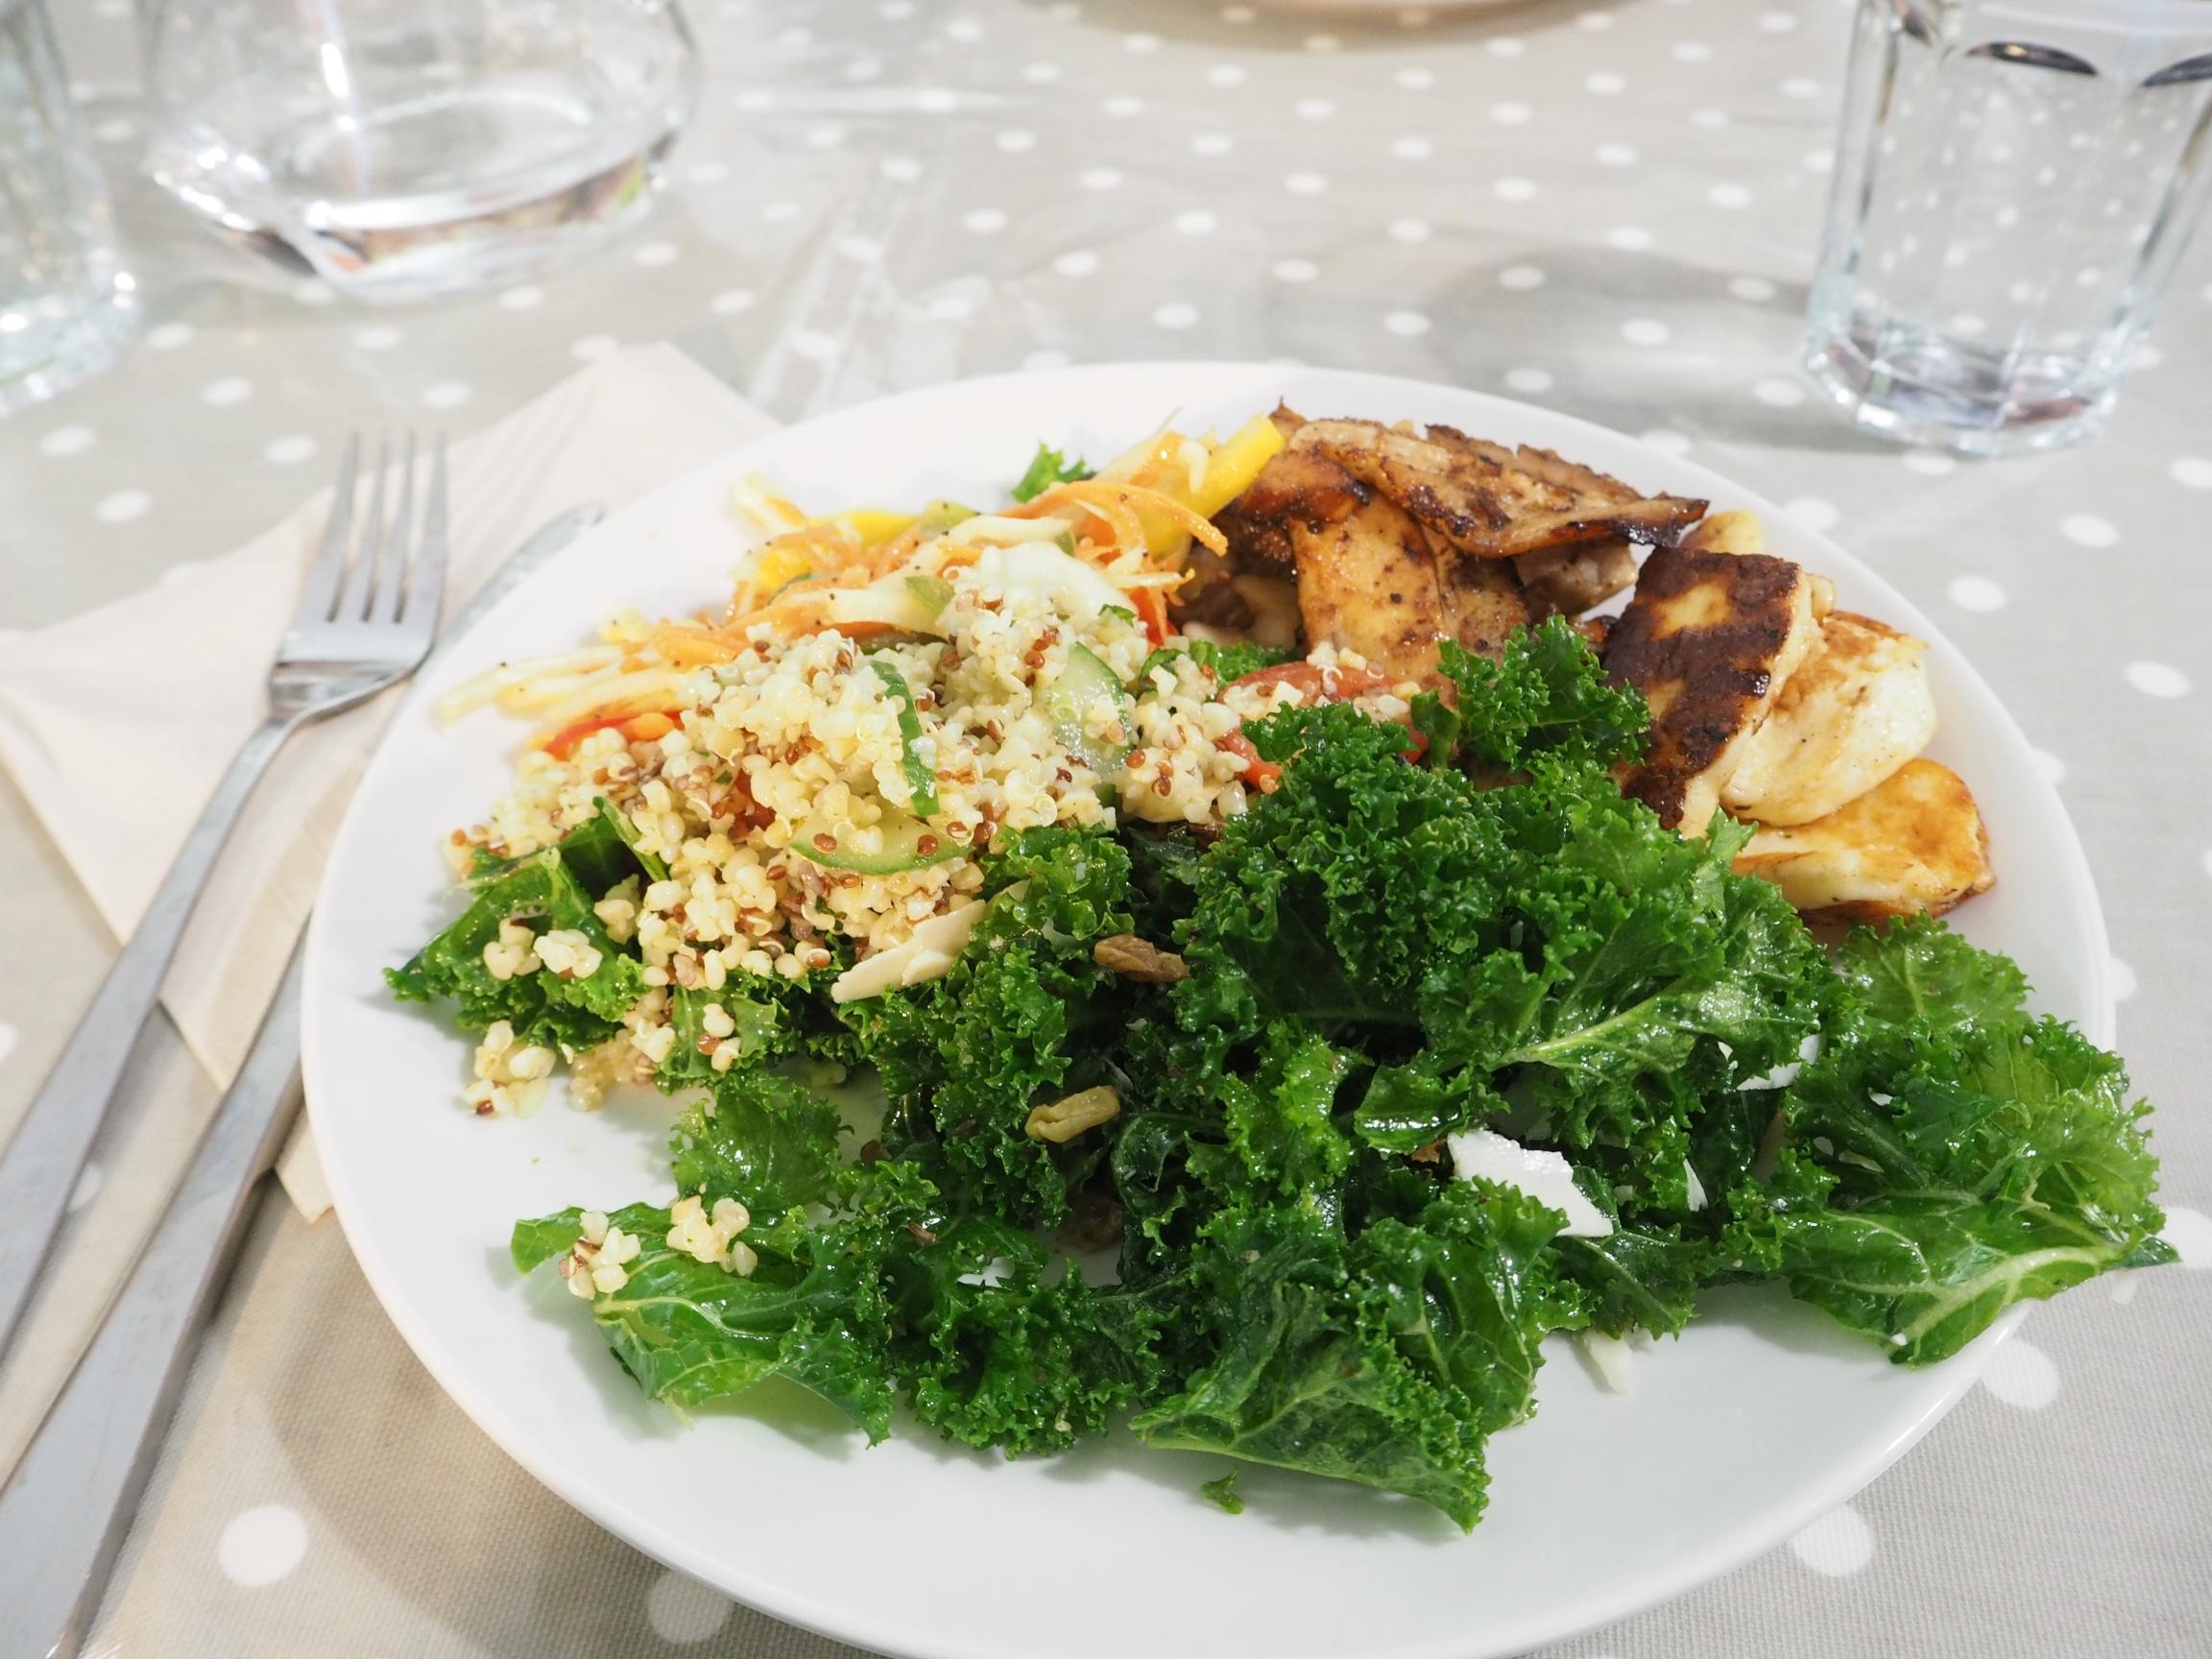 I had grilled halloumi, pork belly and kale salad, summer fresh slaw & quinoa buckwheat salad!